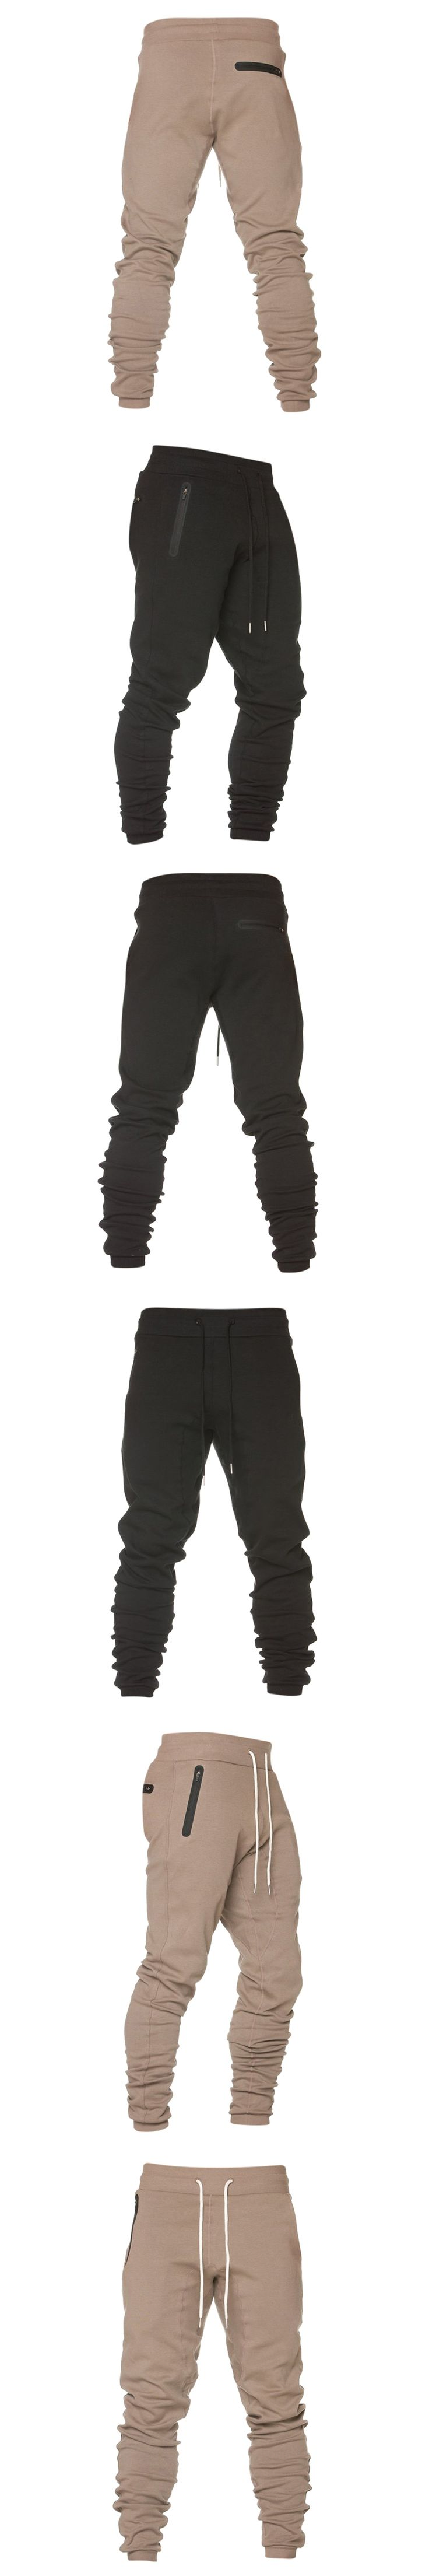 Autumn Spring Sweatpant Men Casual Harem Trousers Elastic Waist Long Tracksuit Bottoms Sportswear Zipper Pockets Solid Color 3XL